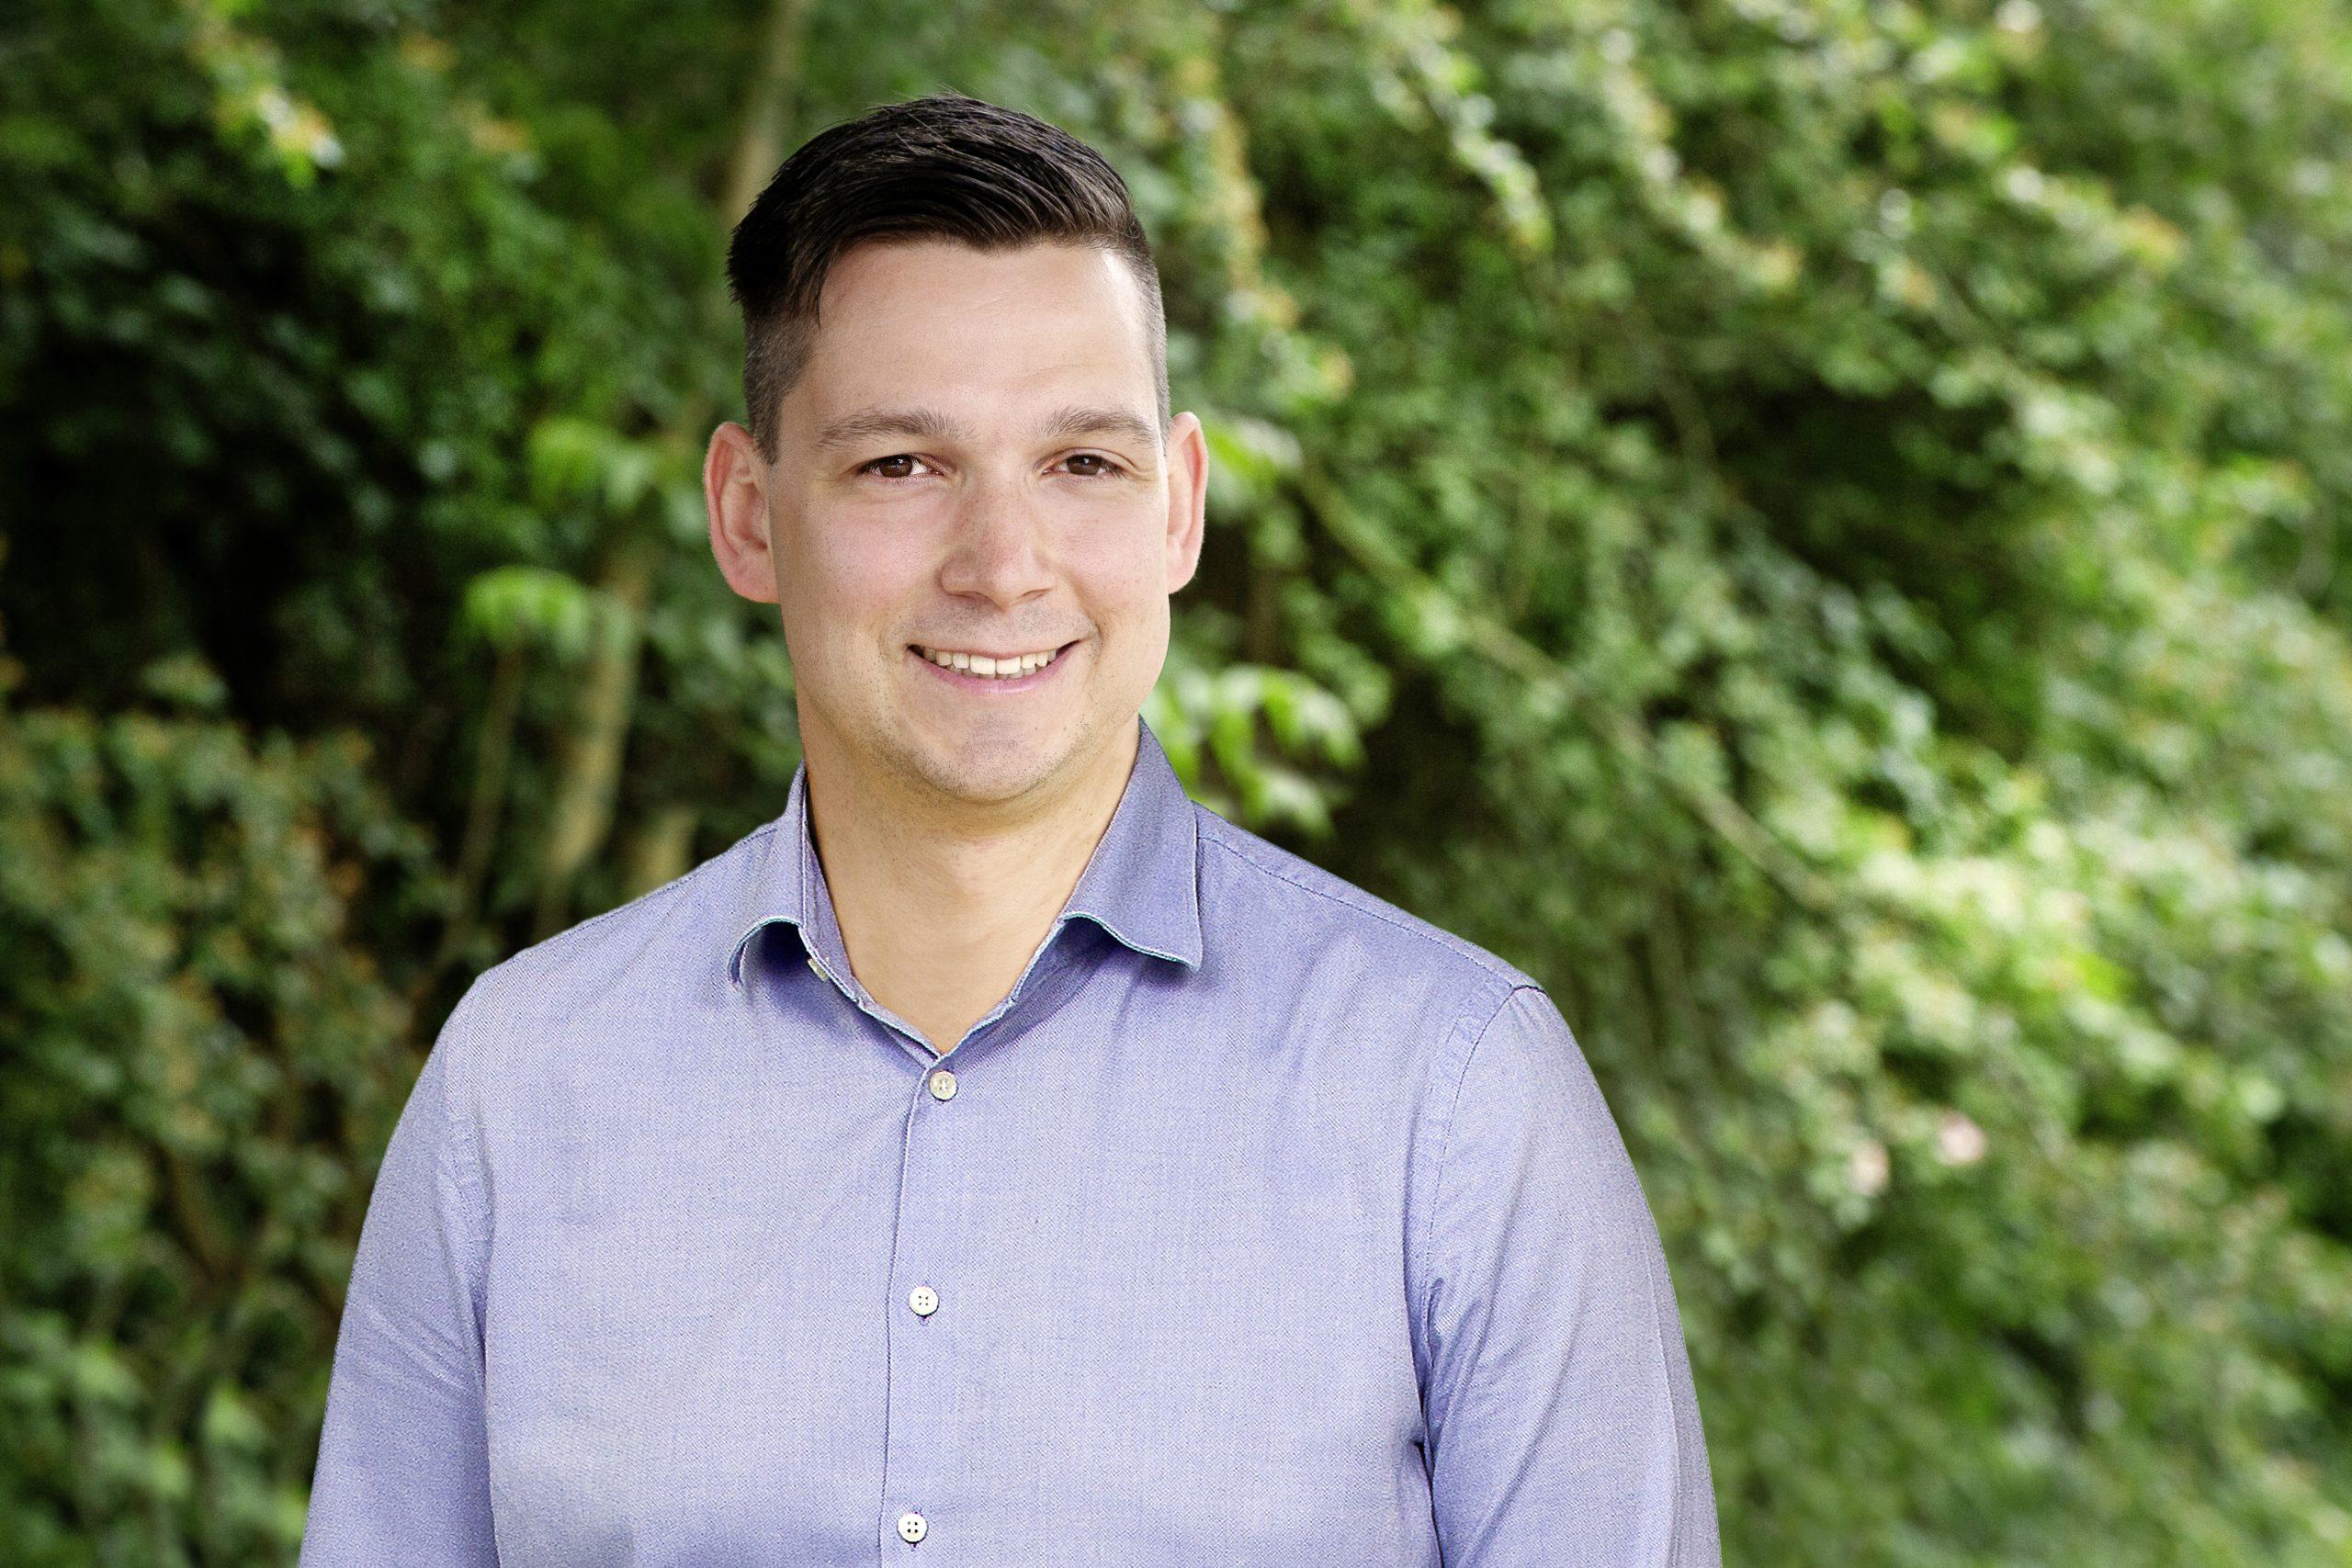 Tristan Richter